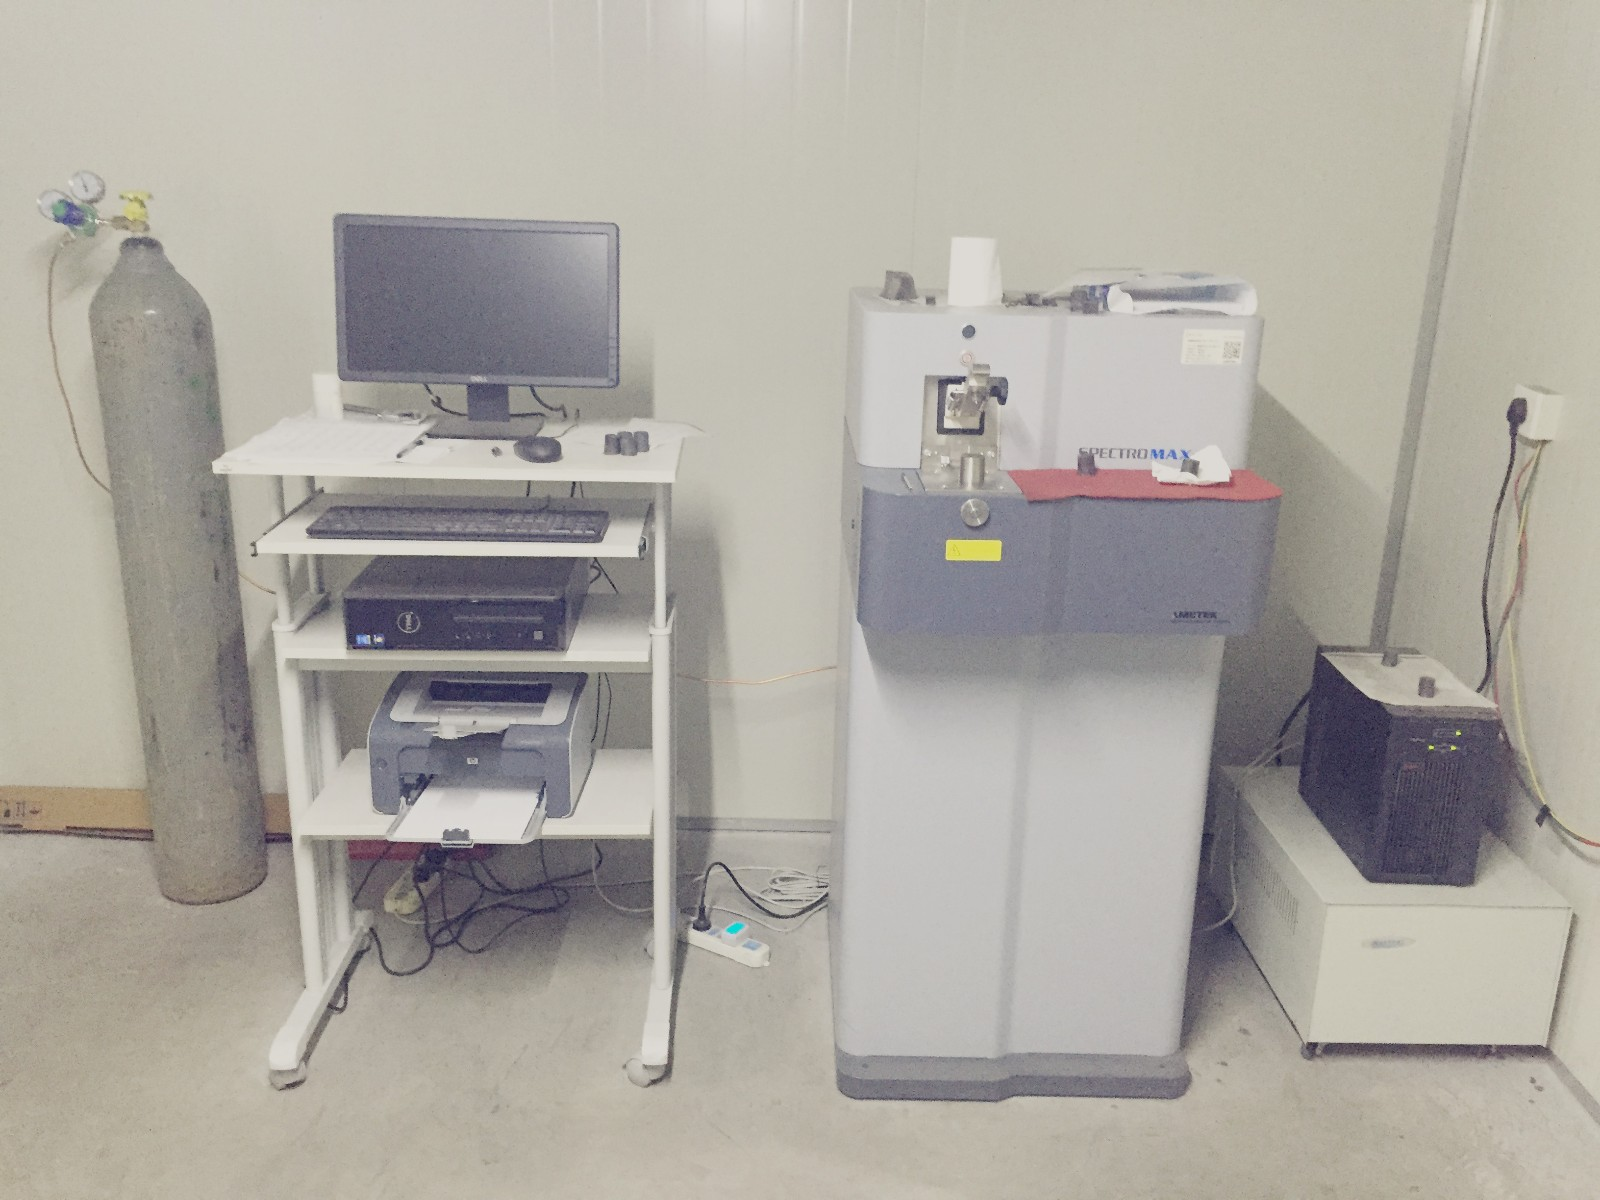 SPECTR Spectrograph